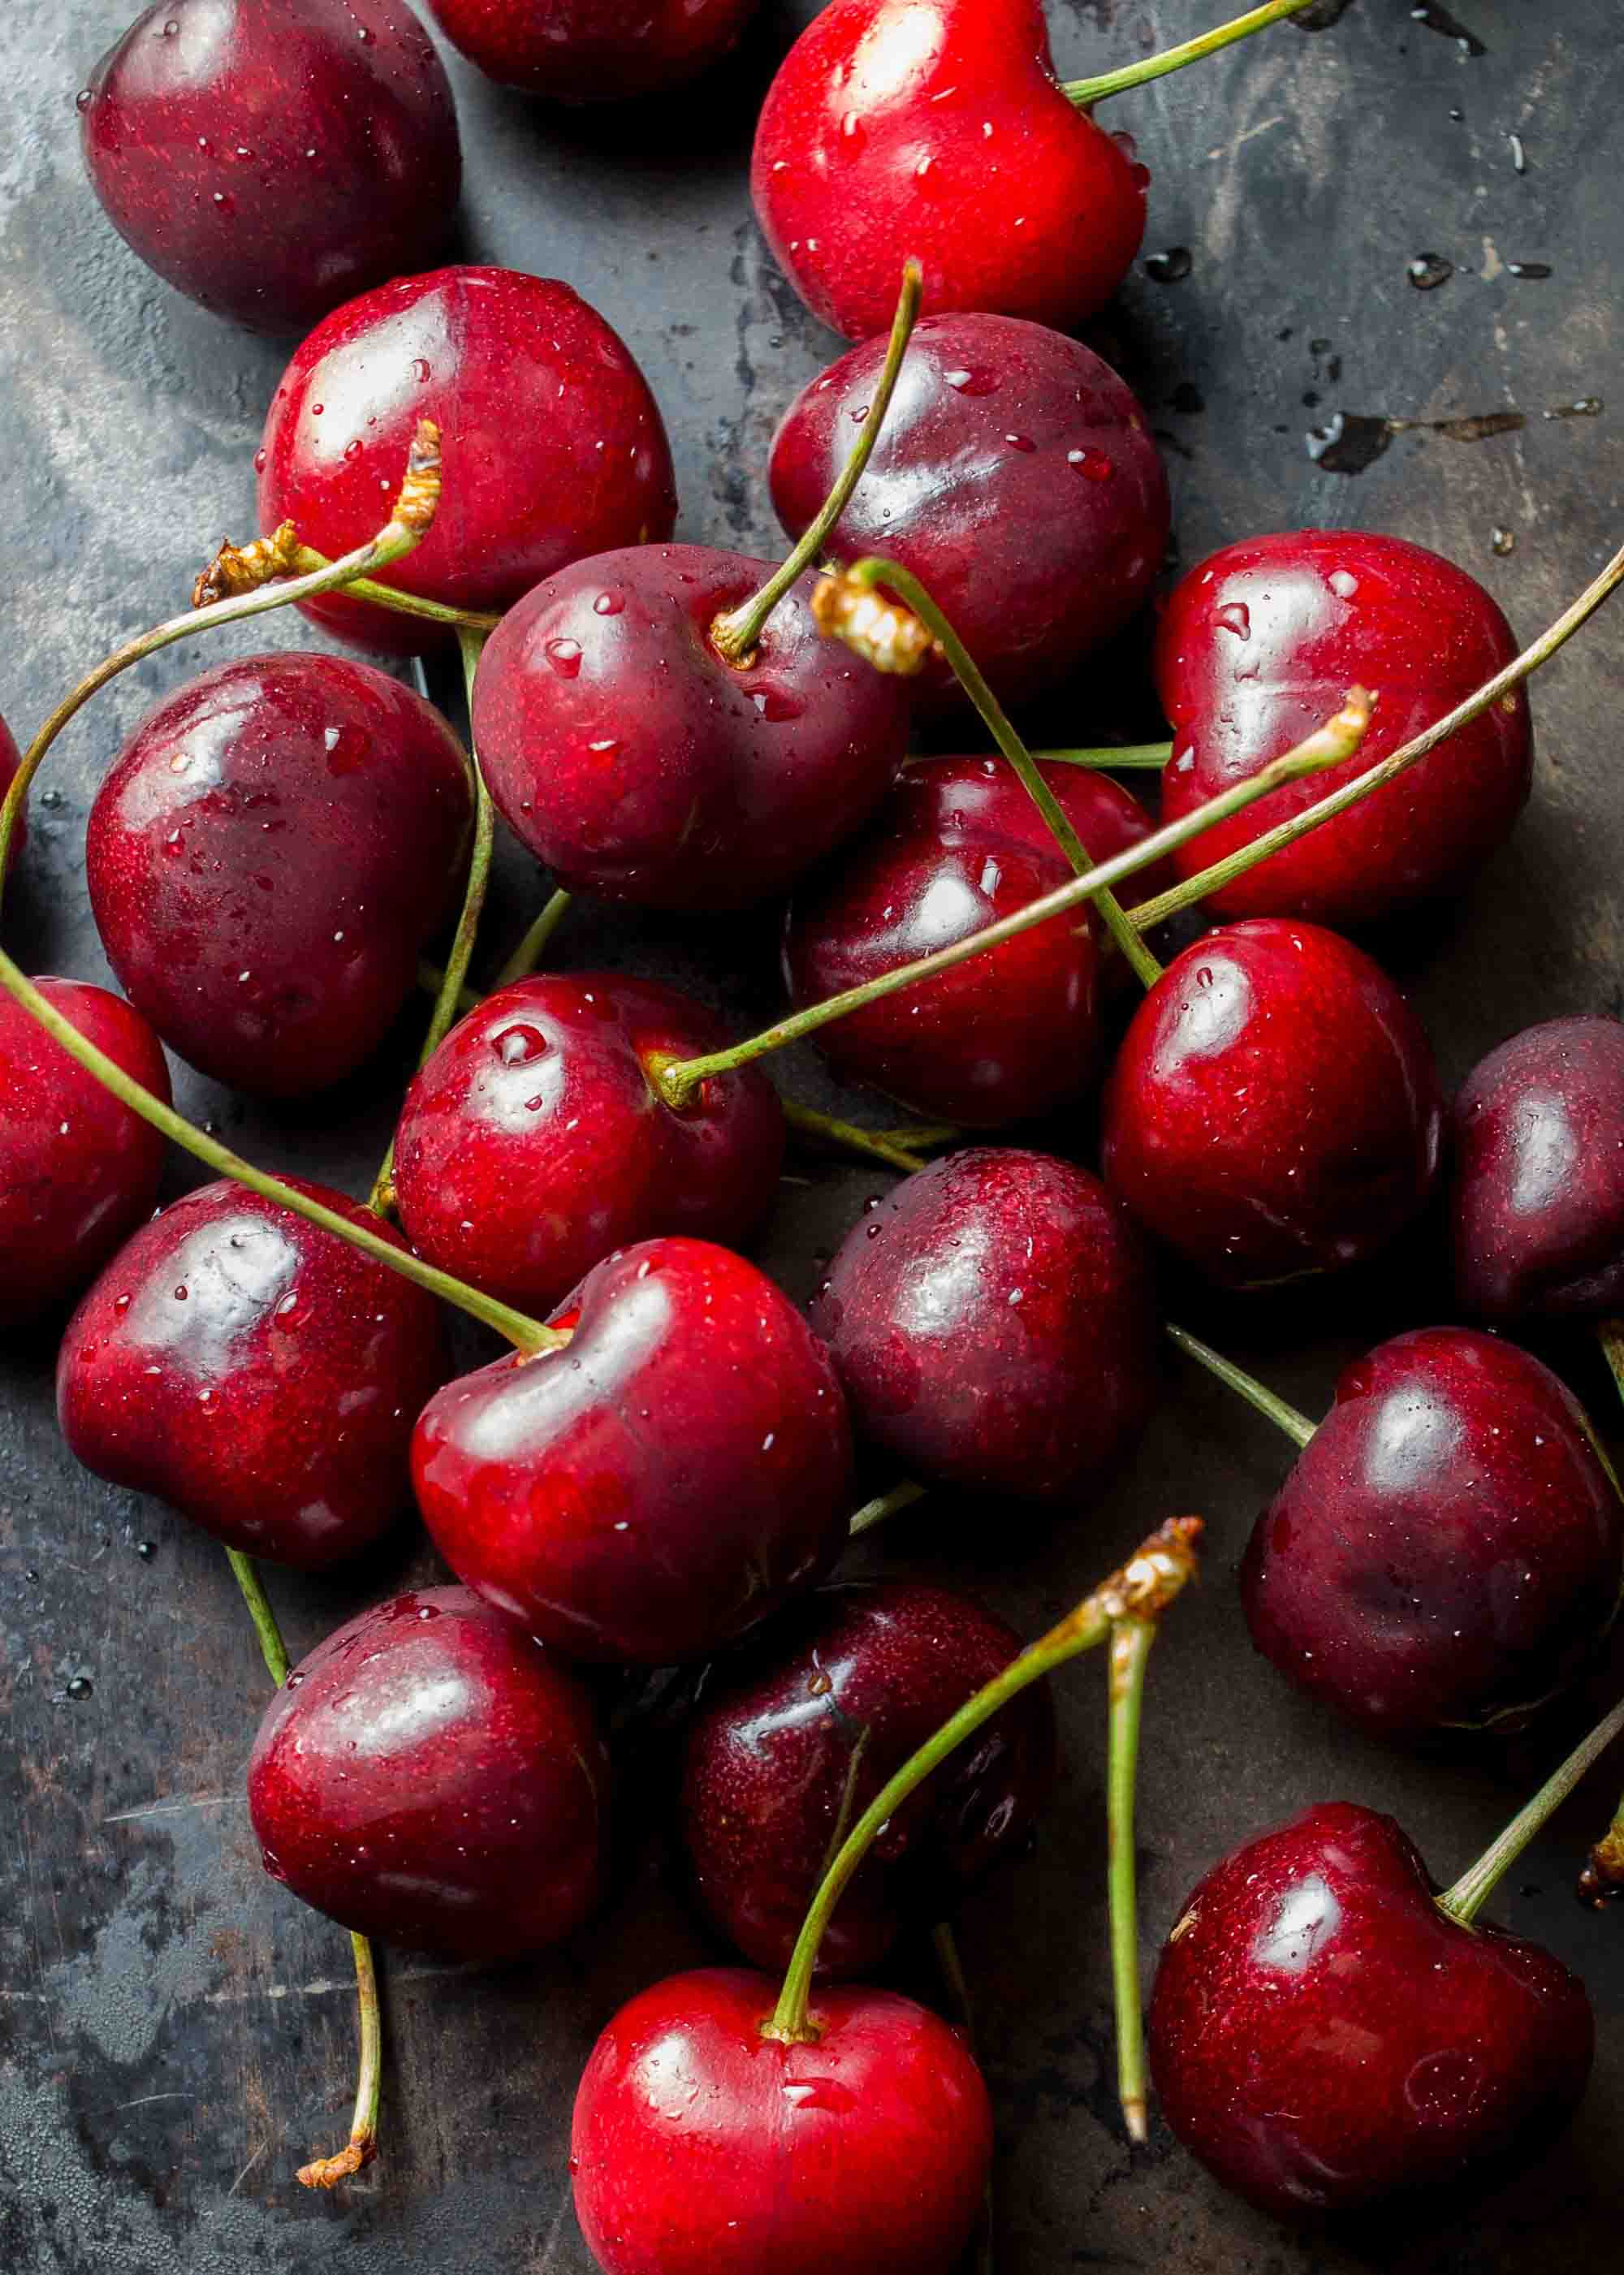 harleq-red-cherry-backgrnd